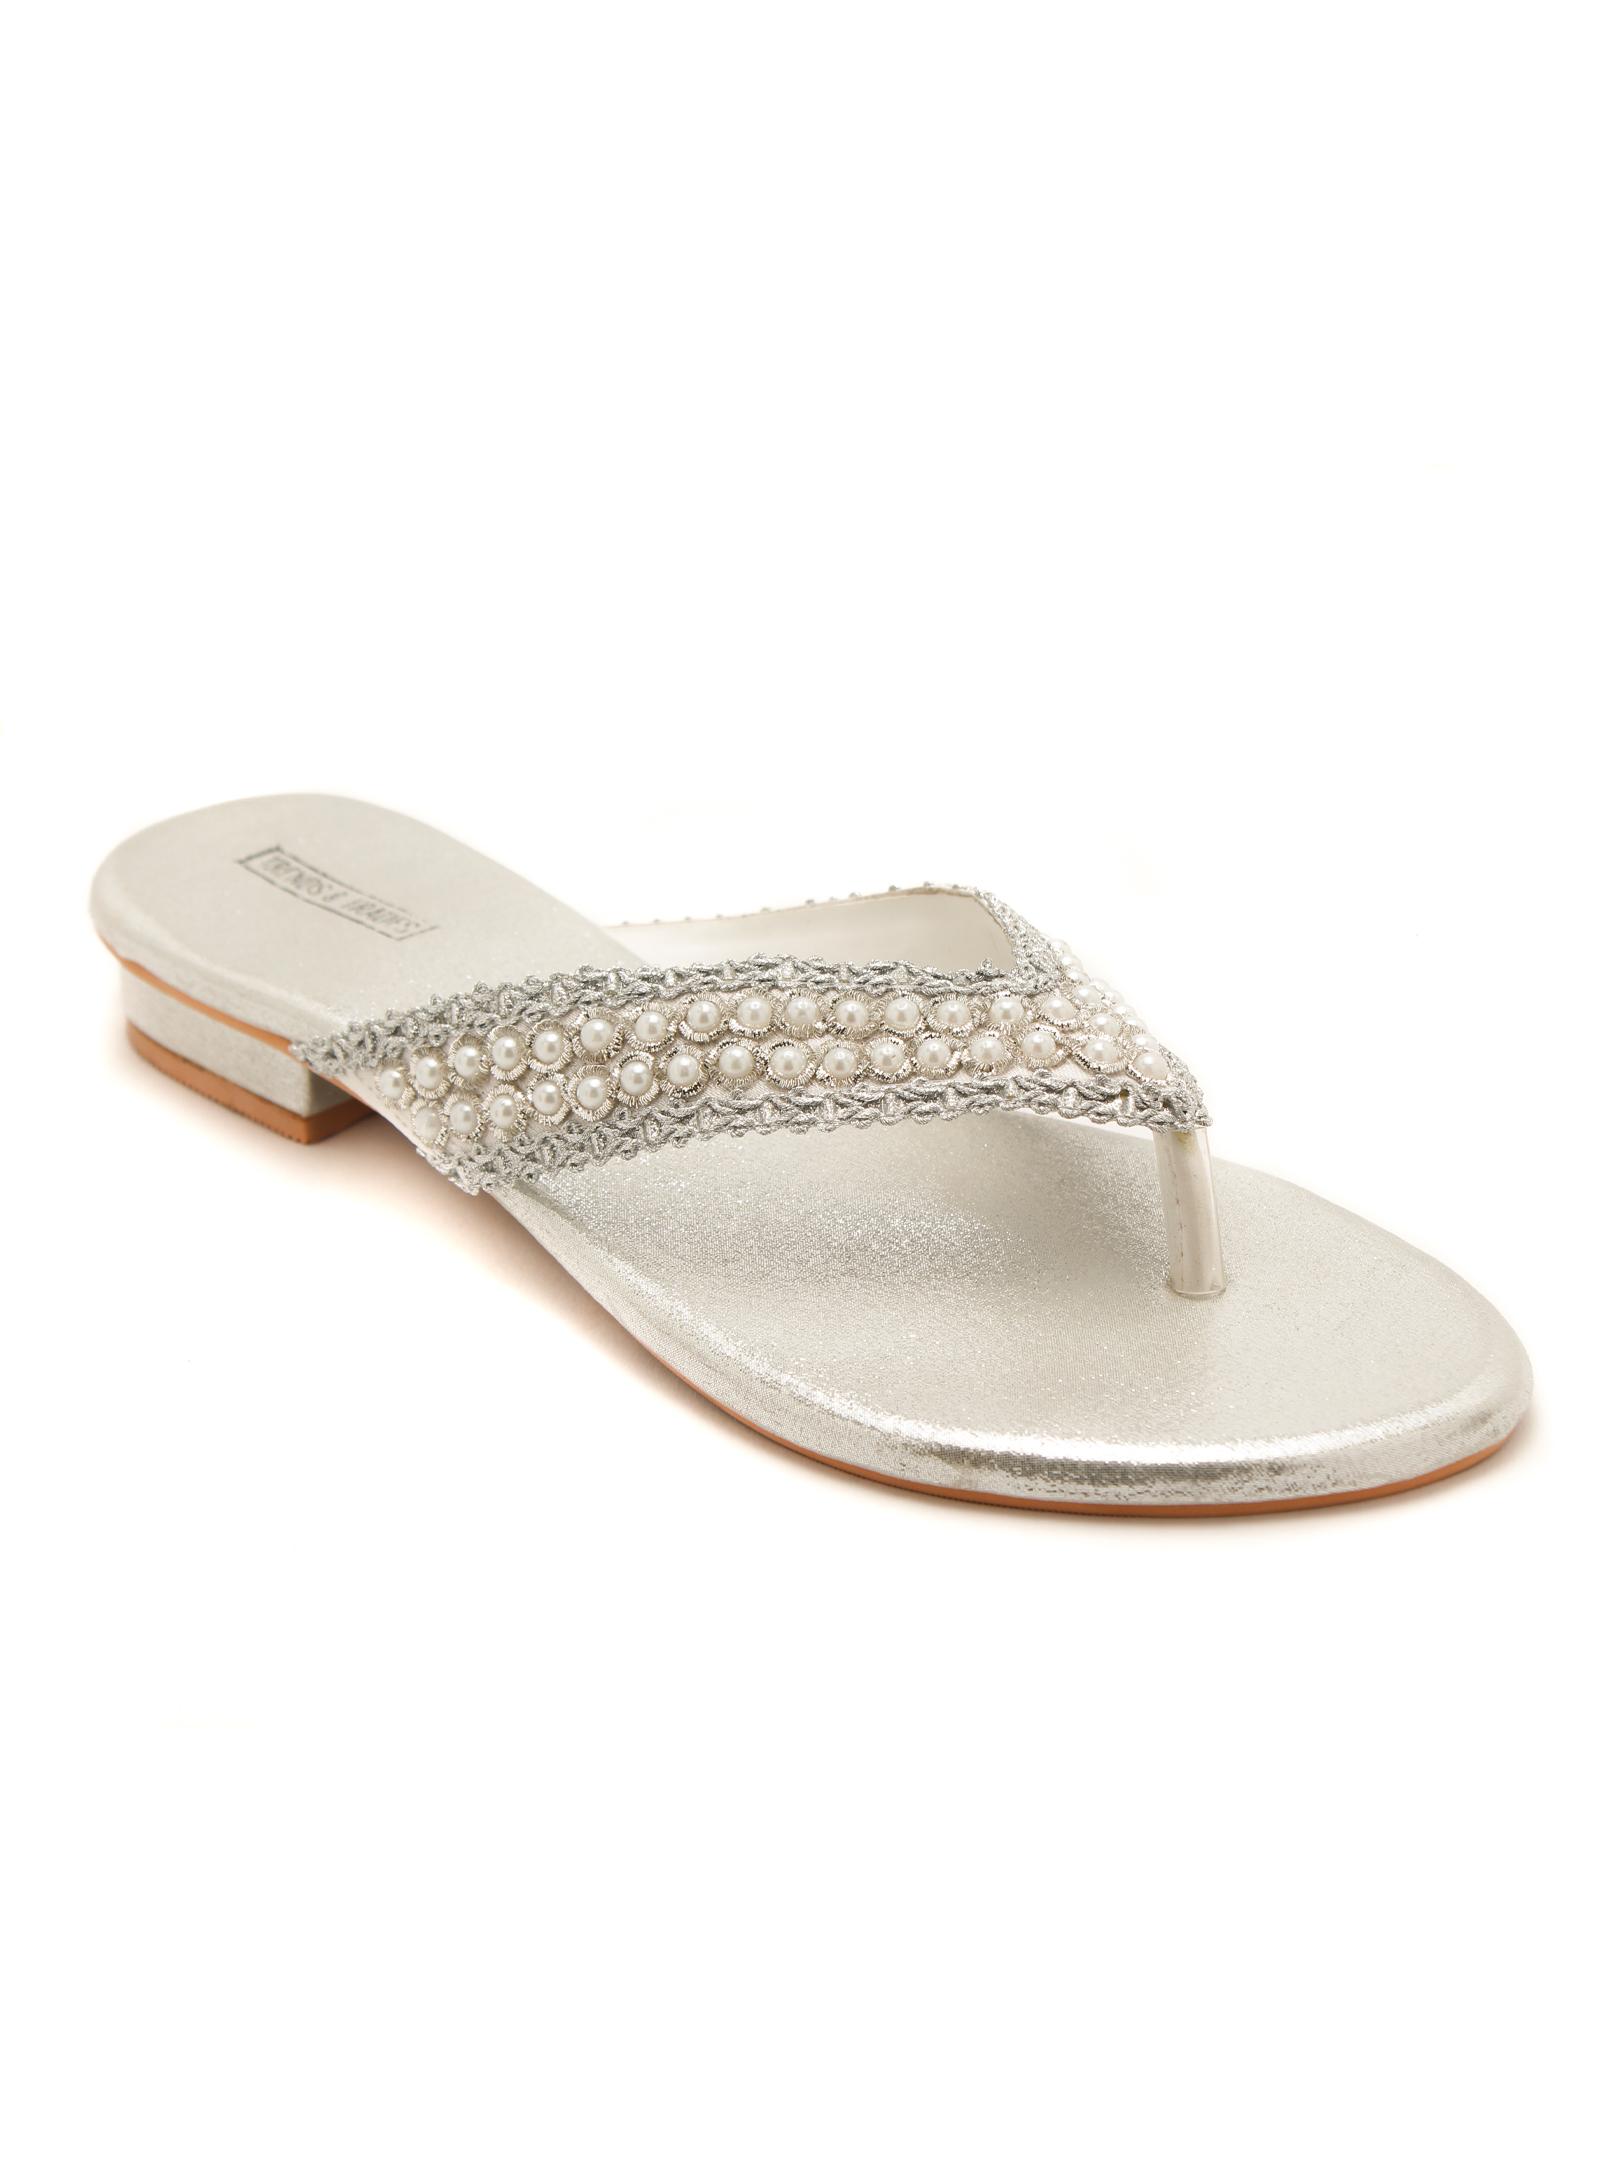 Trends & Trades   Women Silver Embellished Open Toe Flats